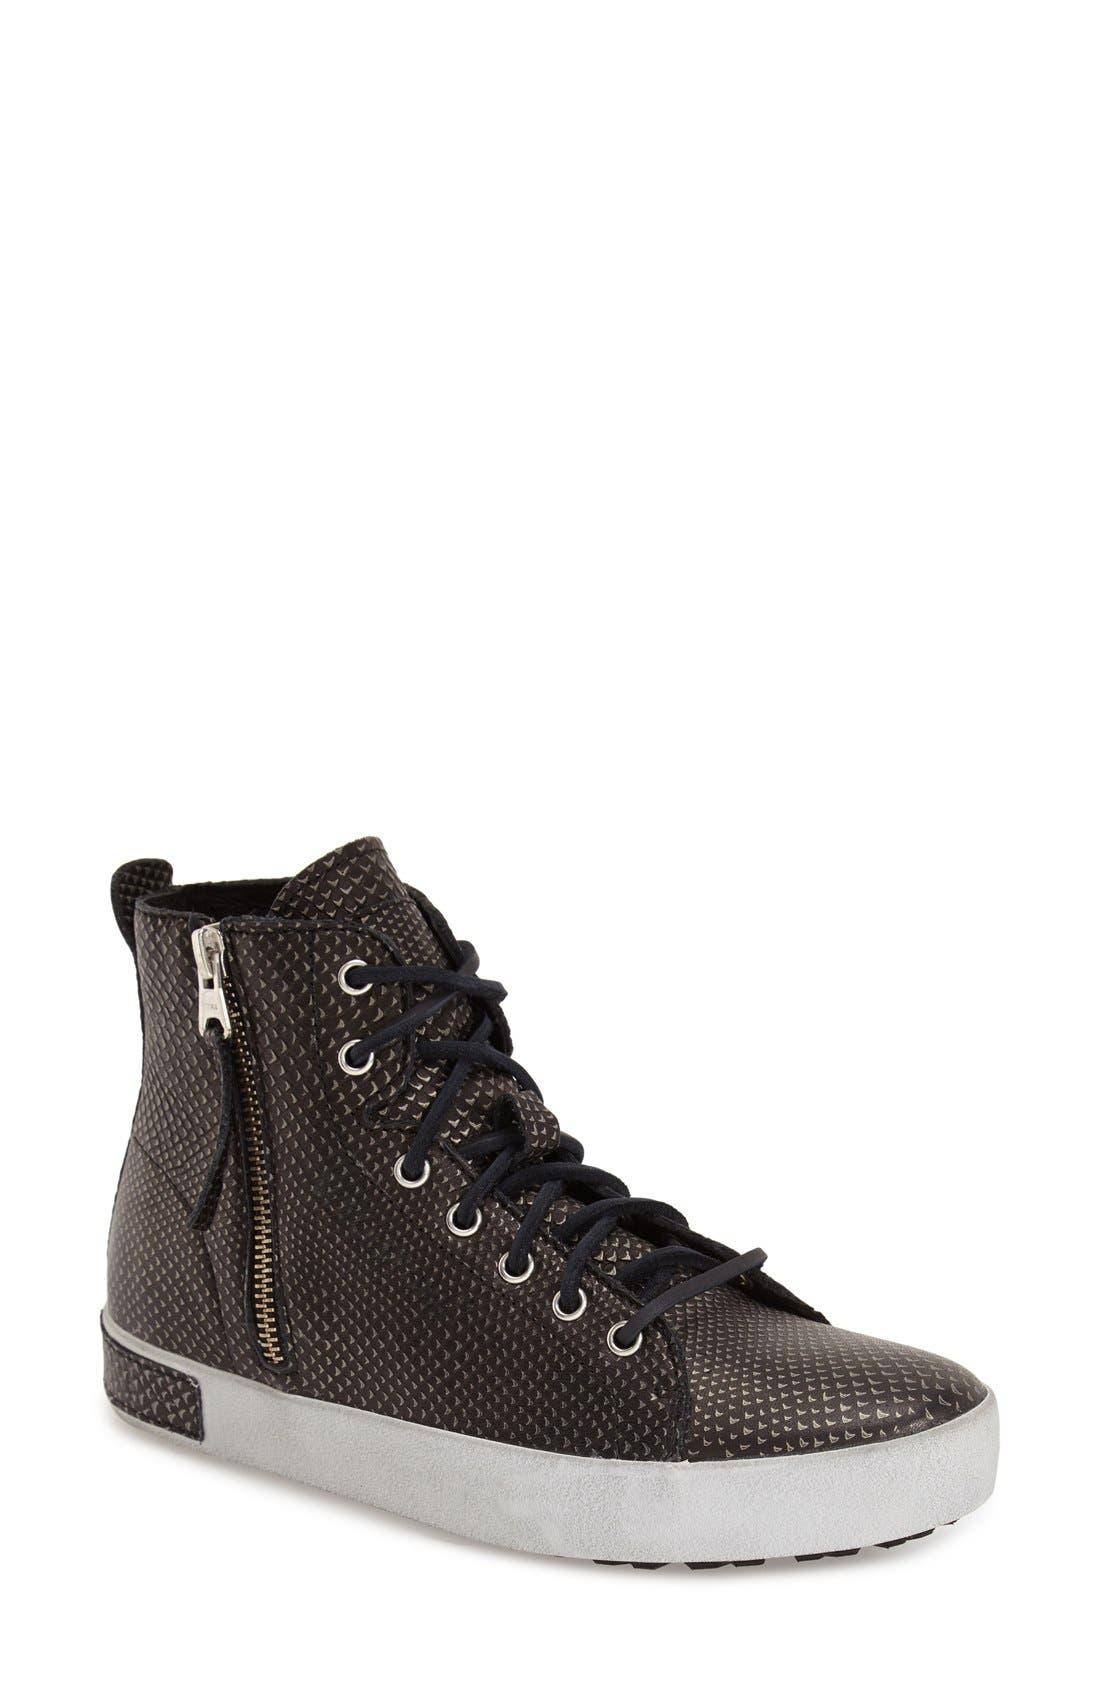 'KL57' High Top Sneaker,                         Main,                         color, Black Metallic Leather